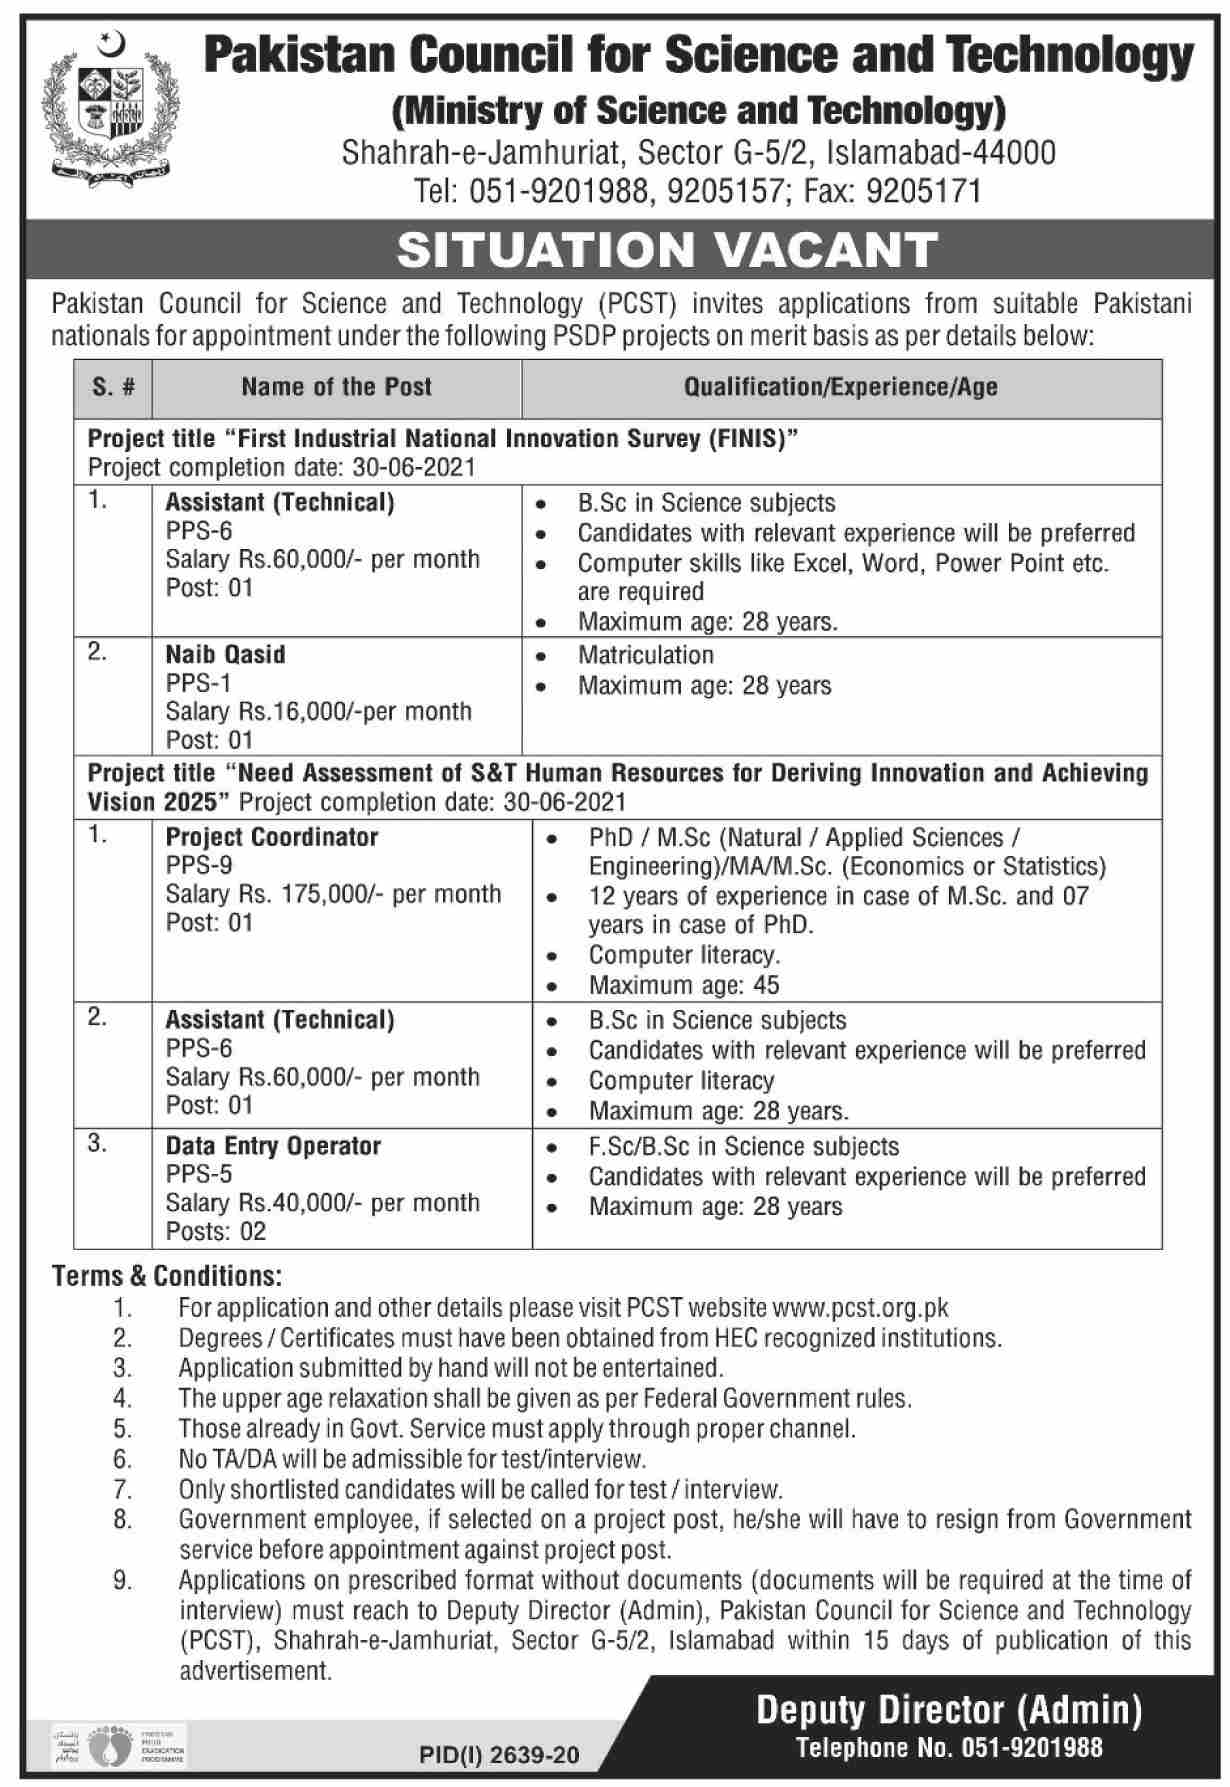 Pakistan Council For Science & Technology PCST Latest Jobs in Pakistan - Download Job Application Form - www.pcst.org.pk Jobs 2021